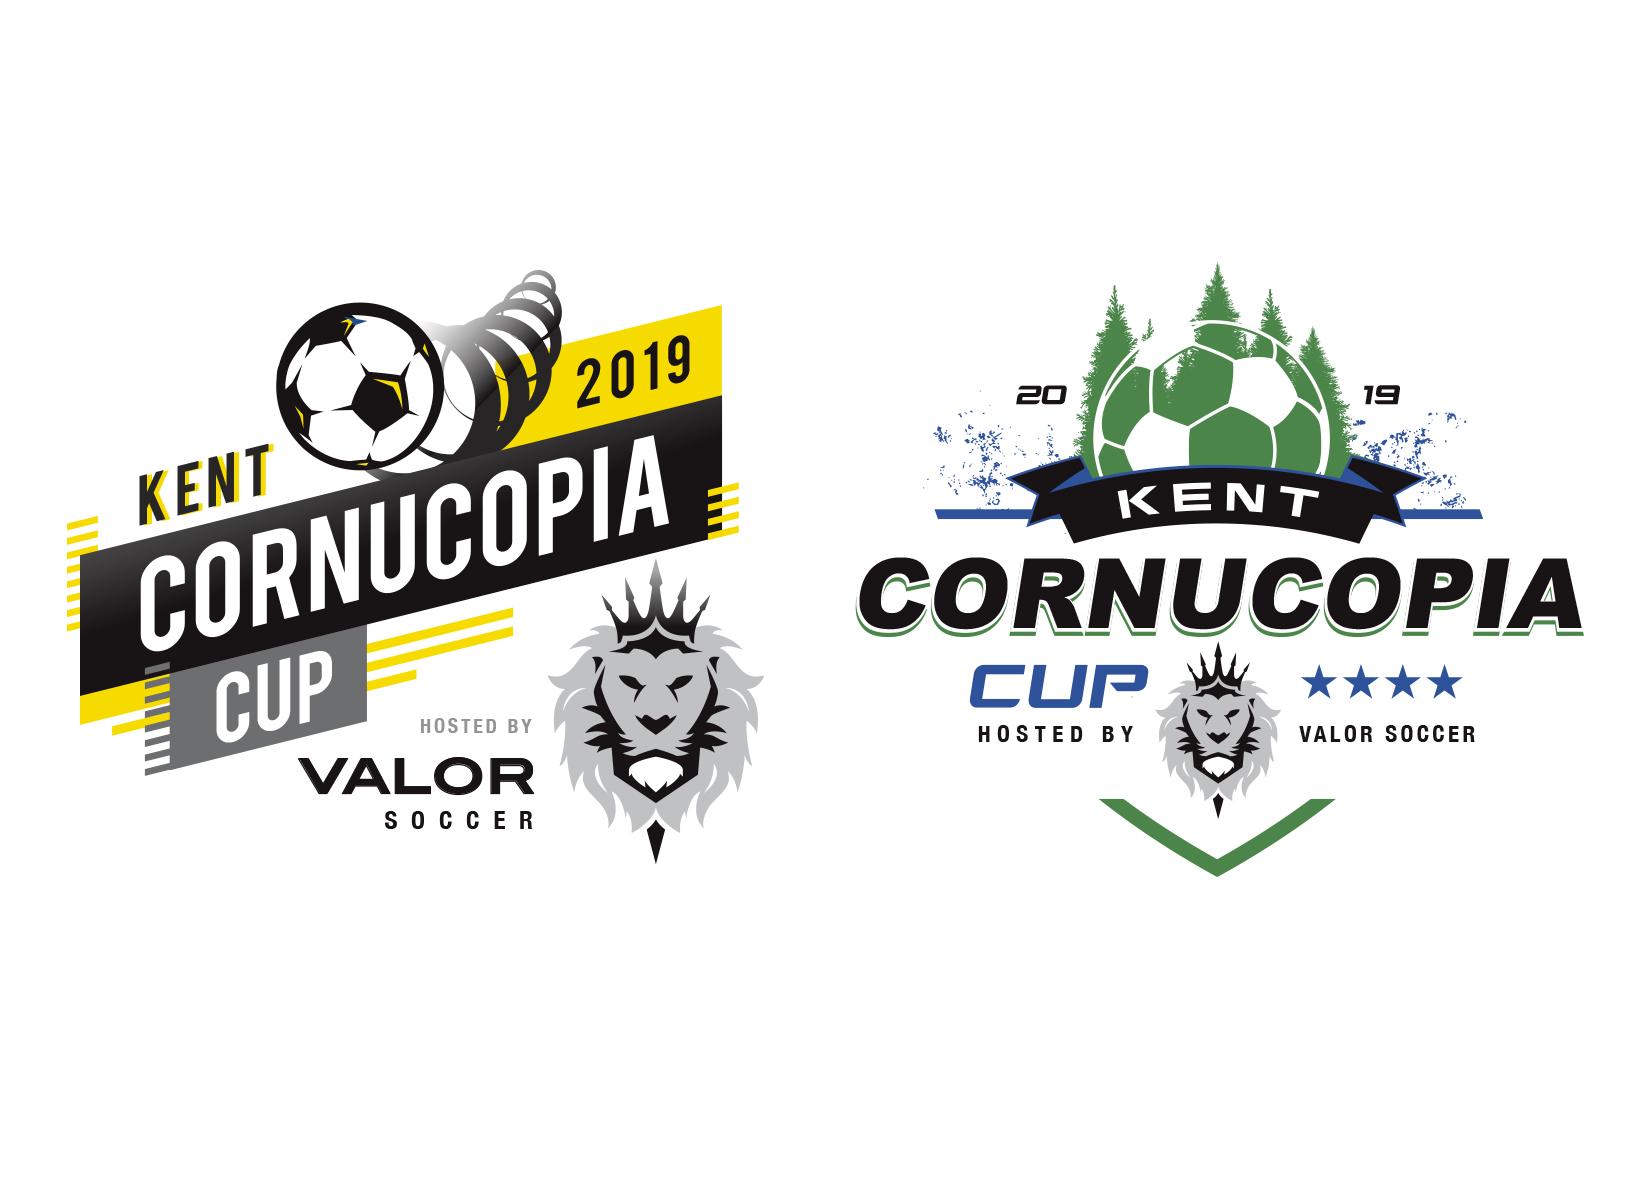 kent-cornucopia-soccer-logo-designs-by-jordan-fretz-6.jpg